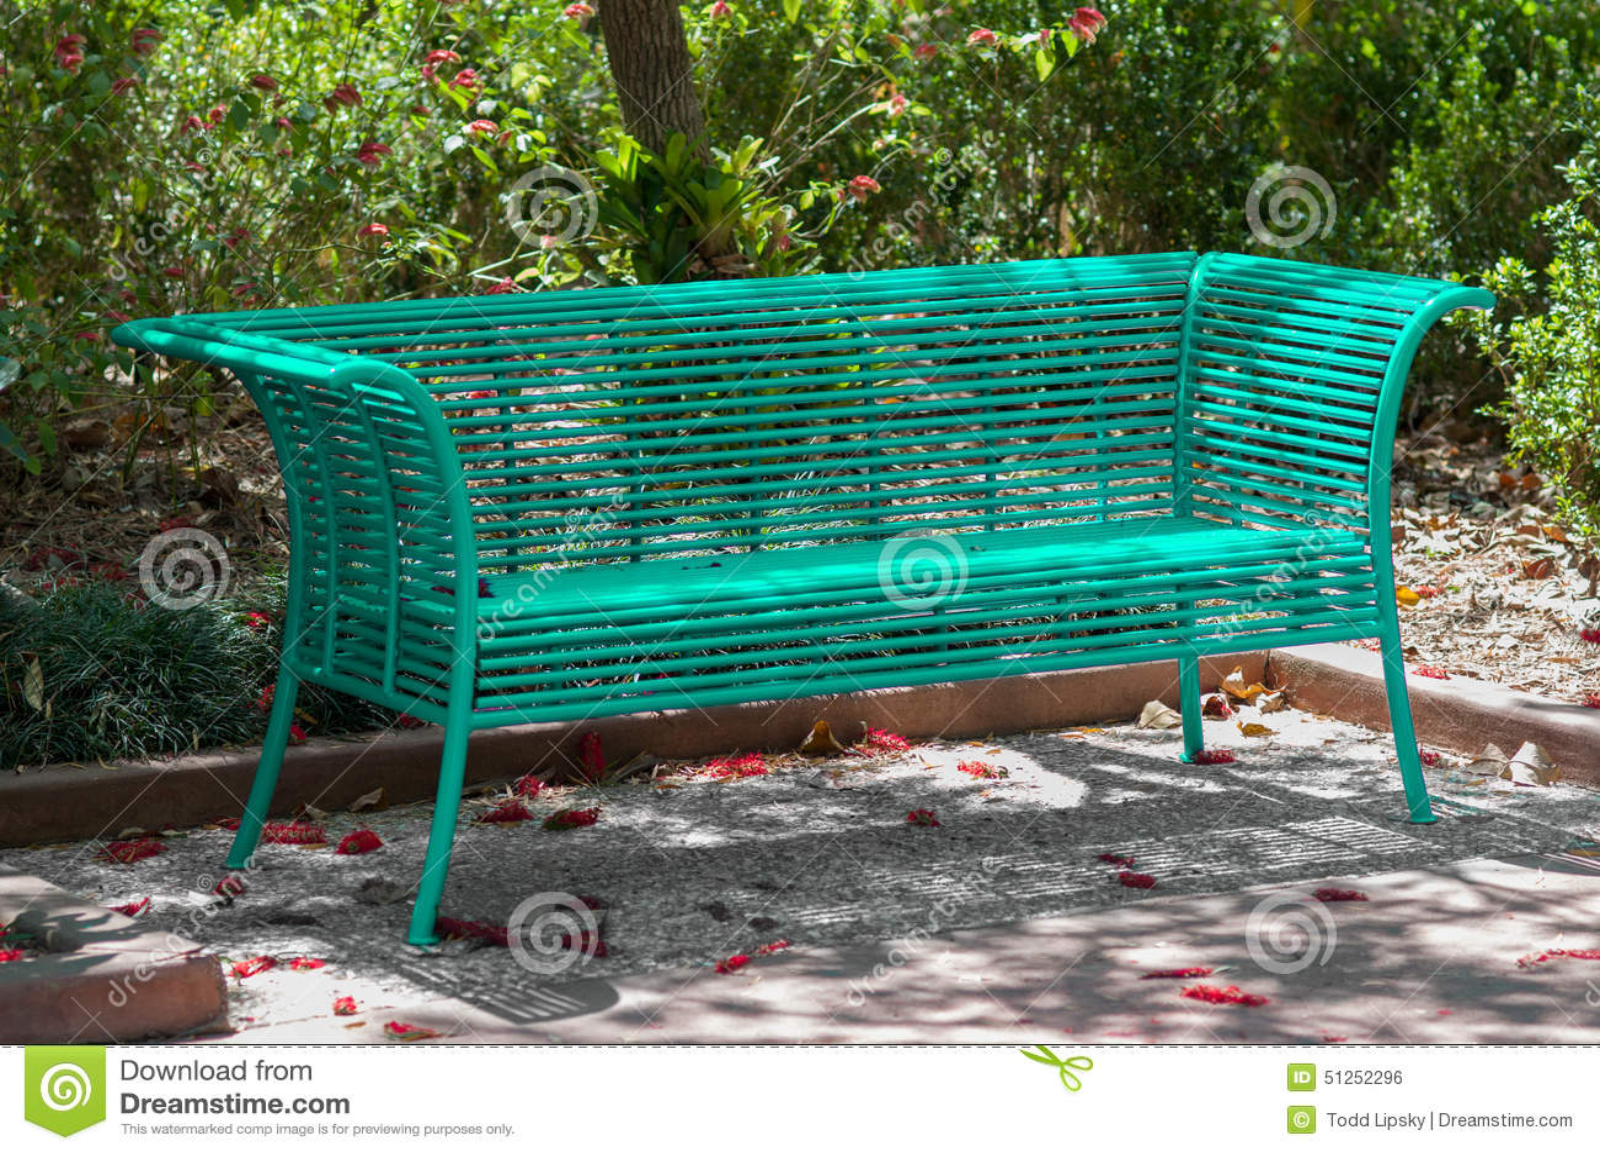 Teal Park Bench